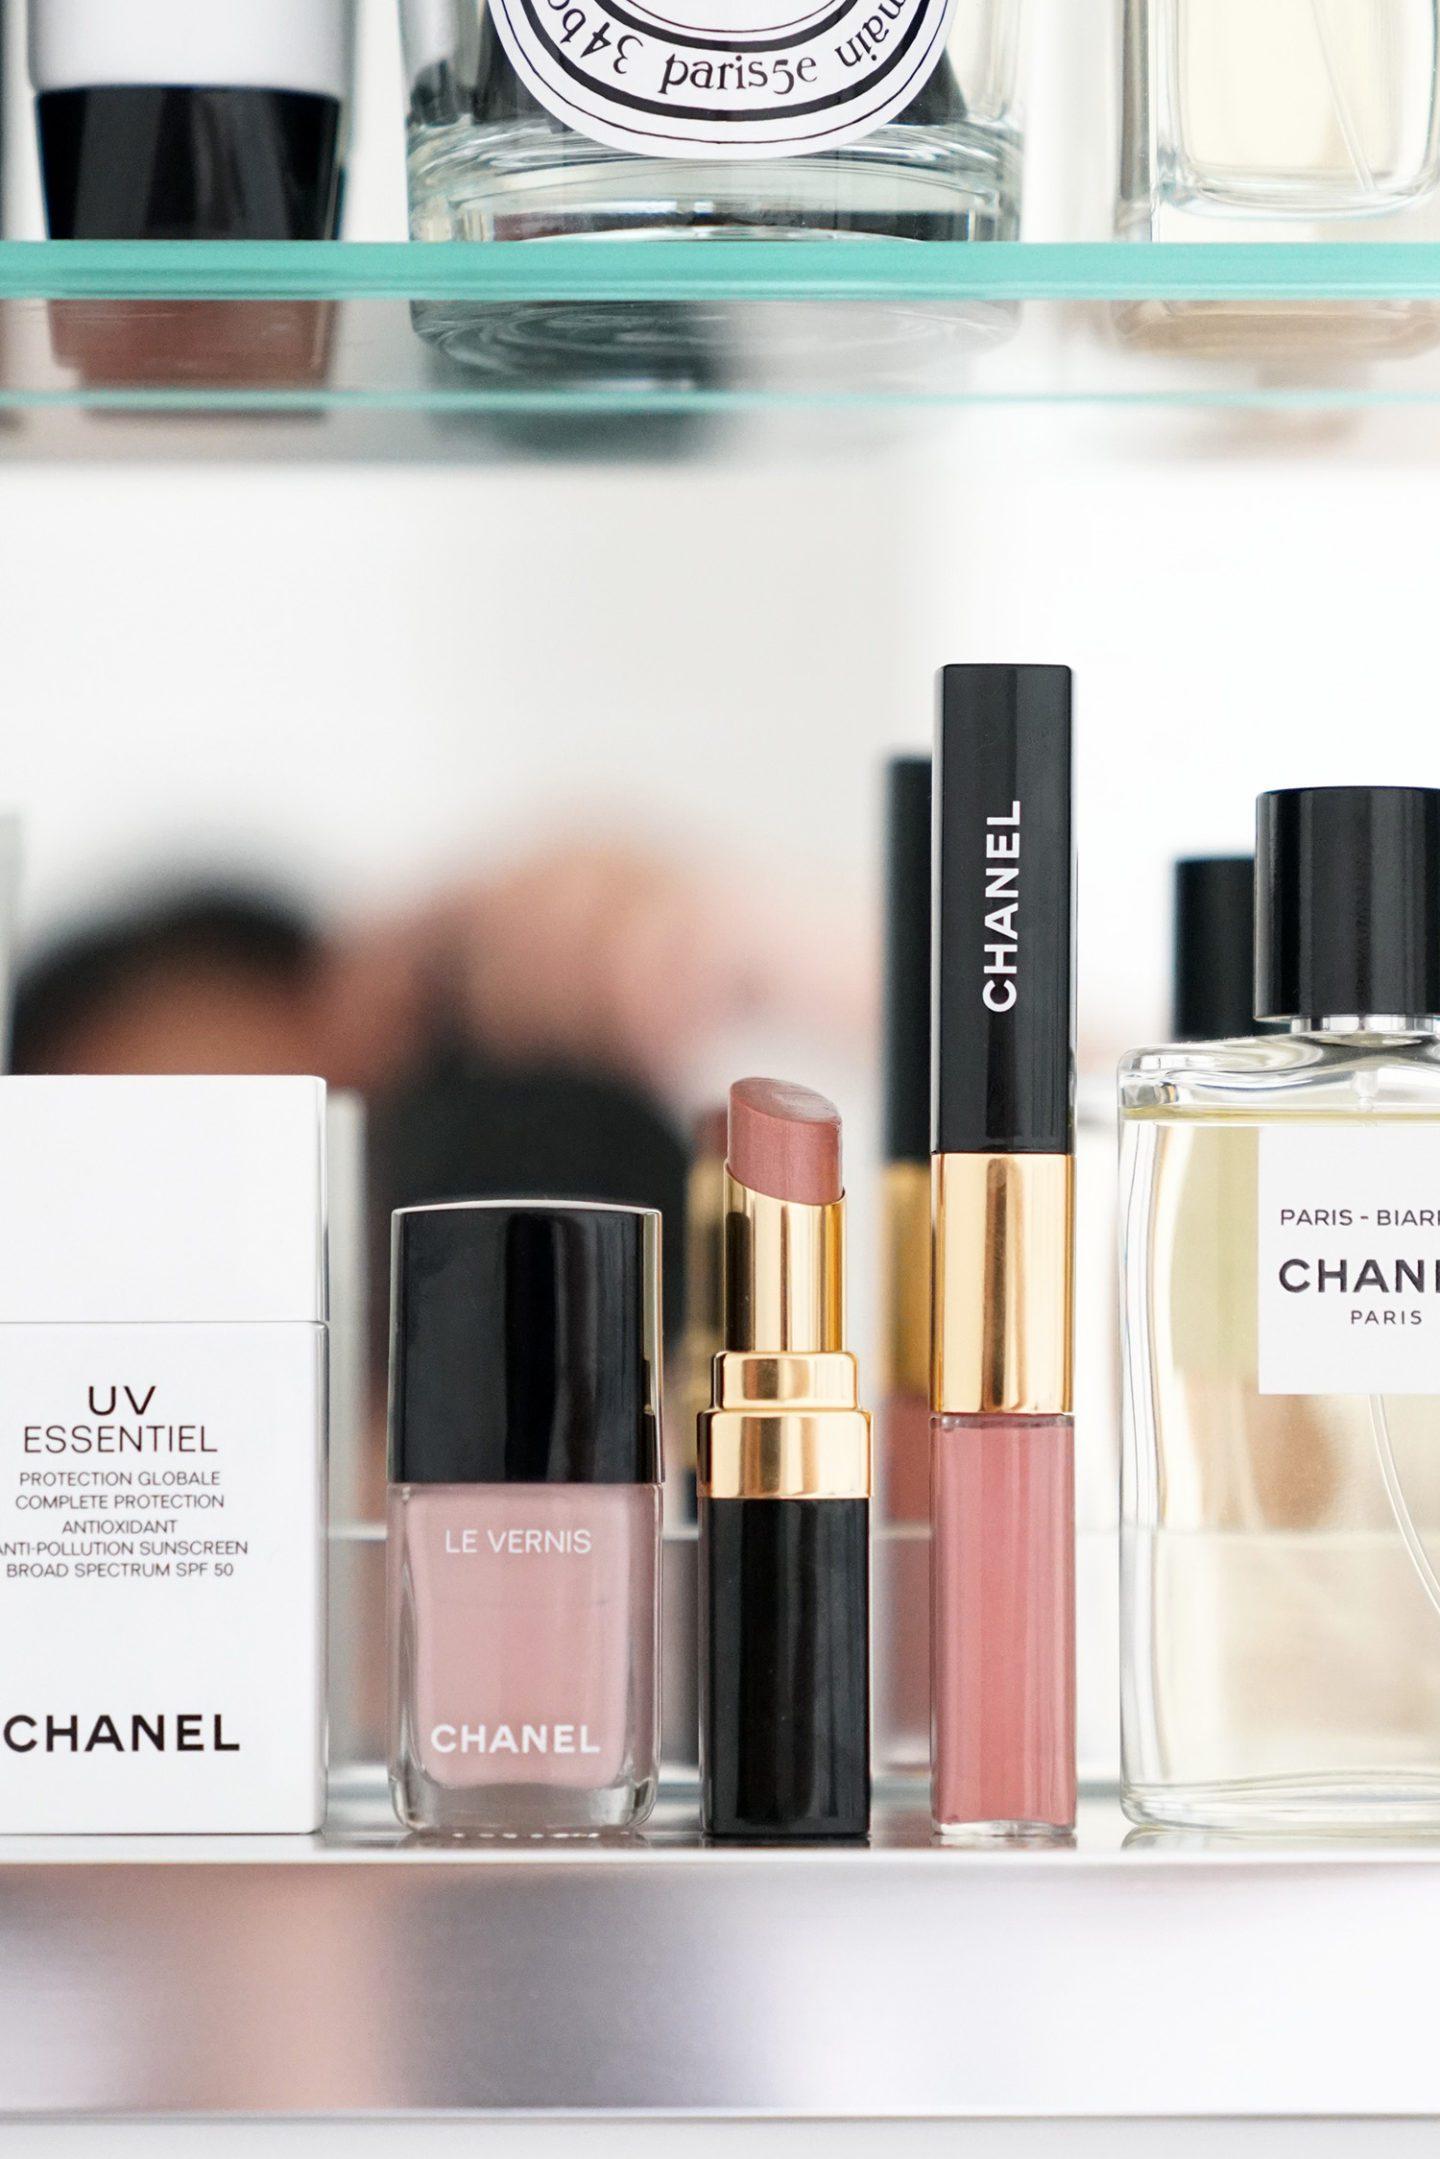 Chanel Le Vernis Organdi